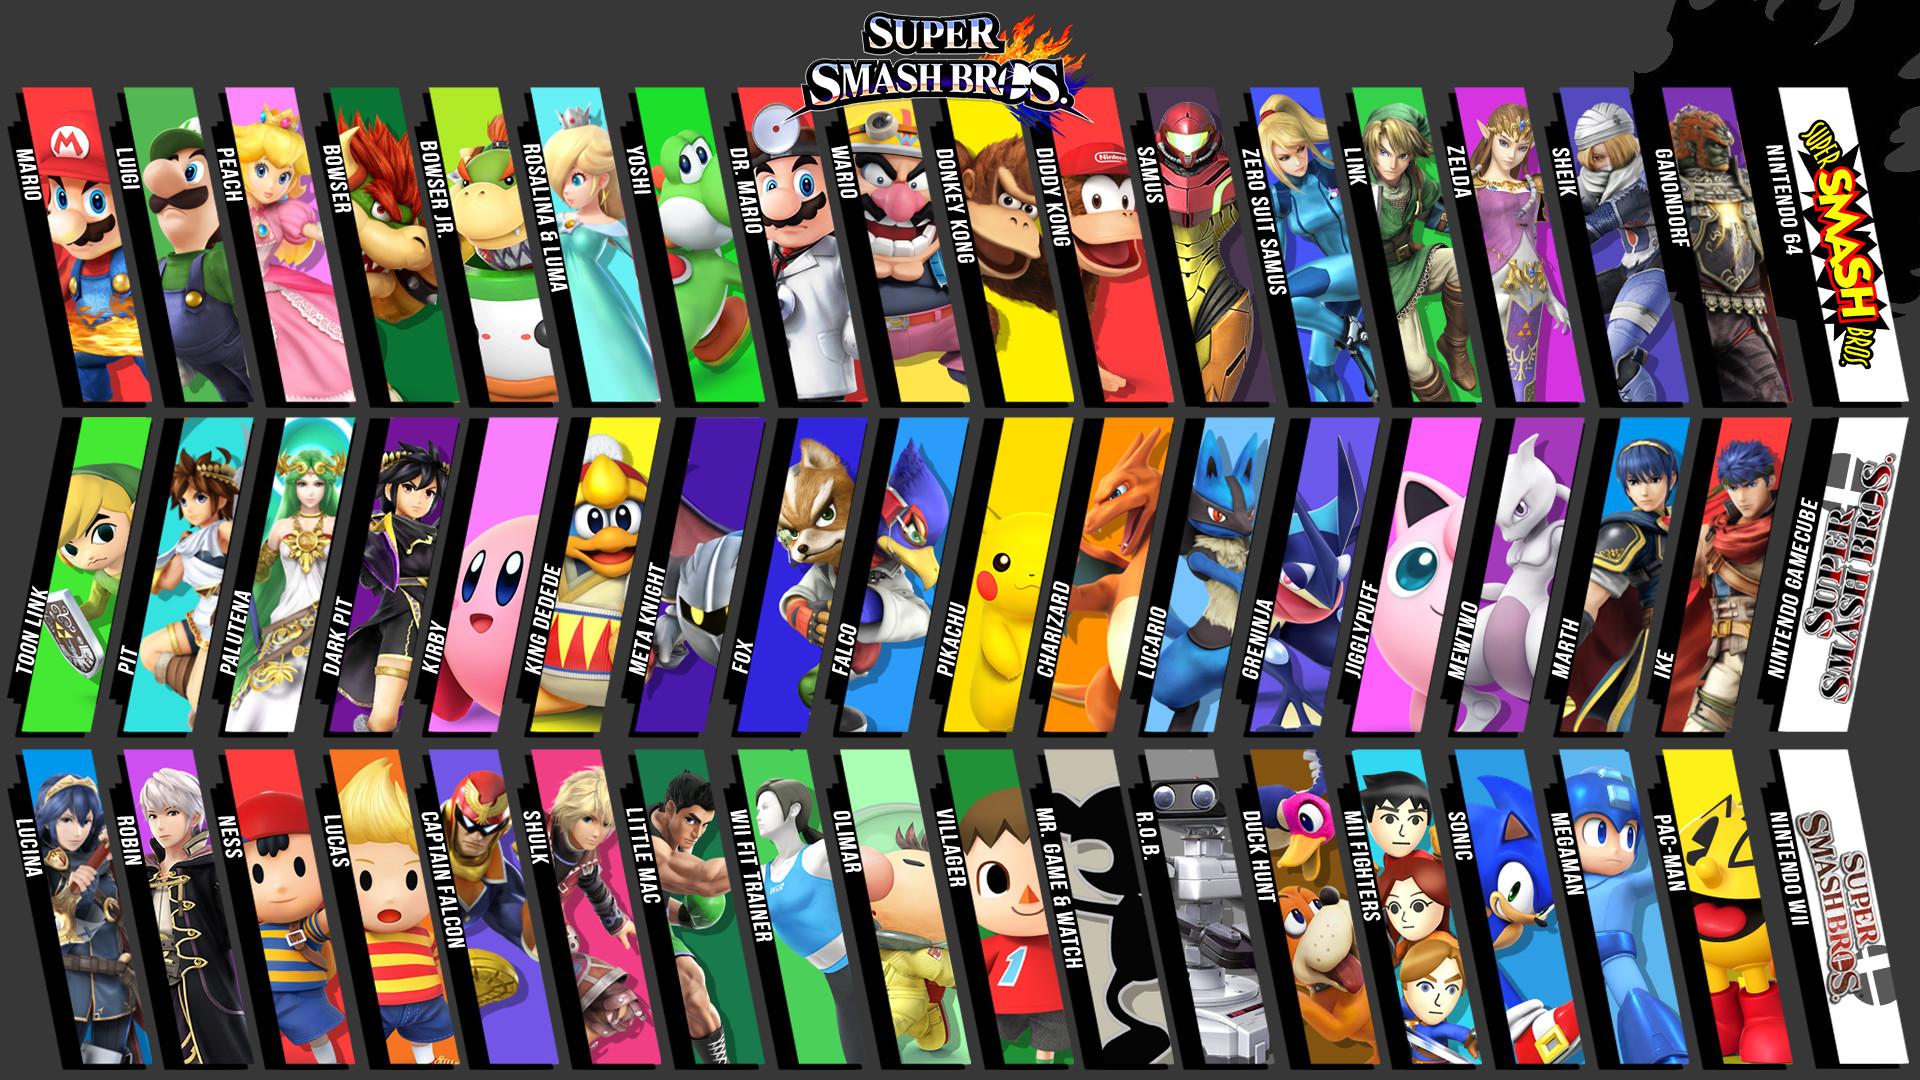 Super Smash Bros. for Wii U/3DS 1080p Wallpaper! by KohleWithAK on .